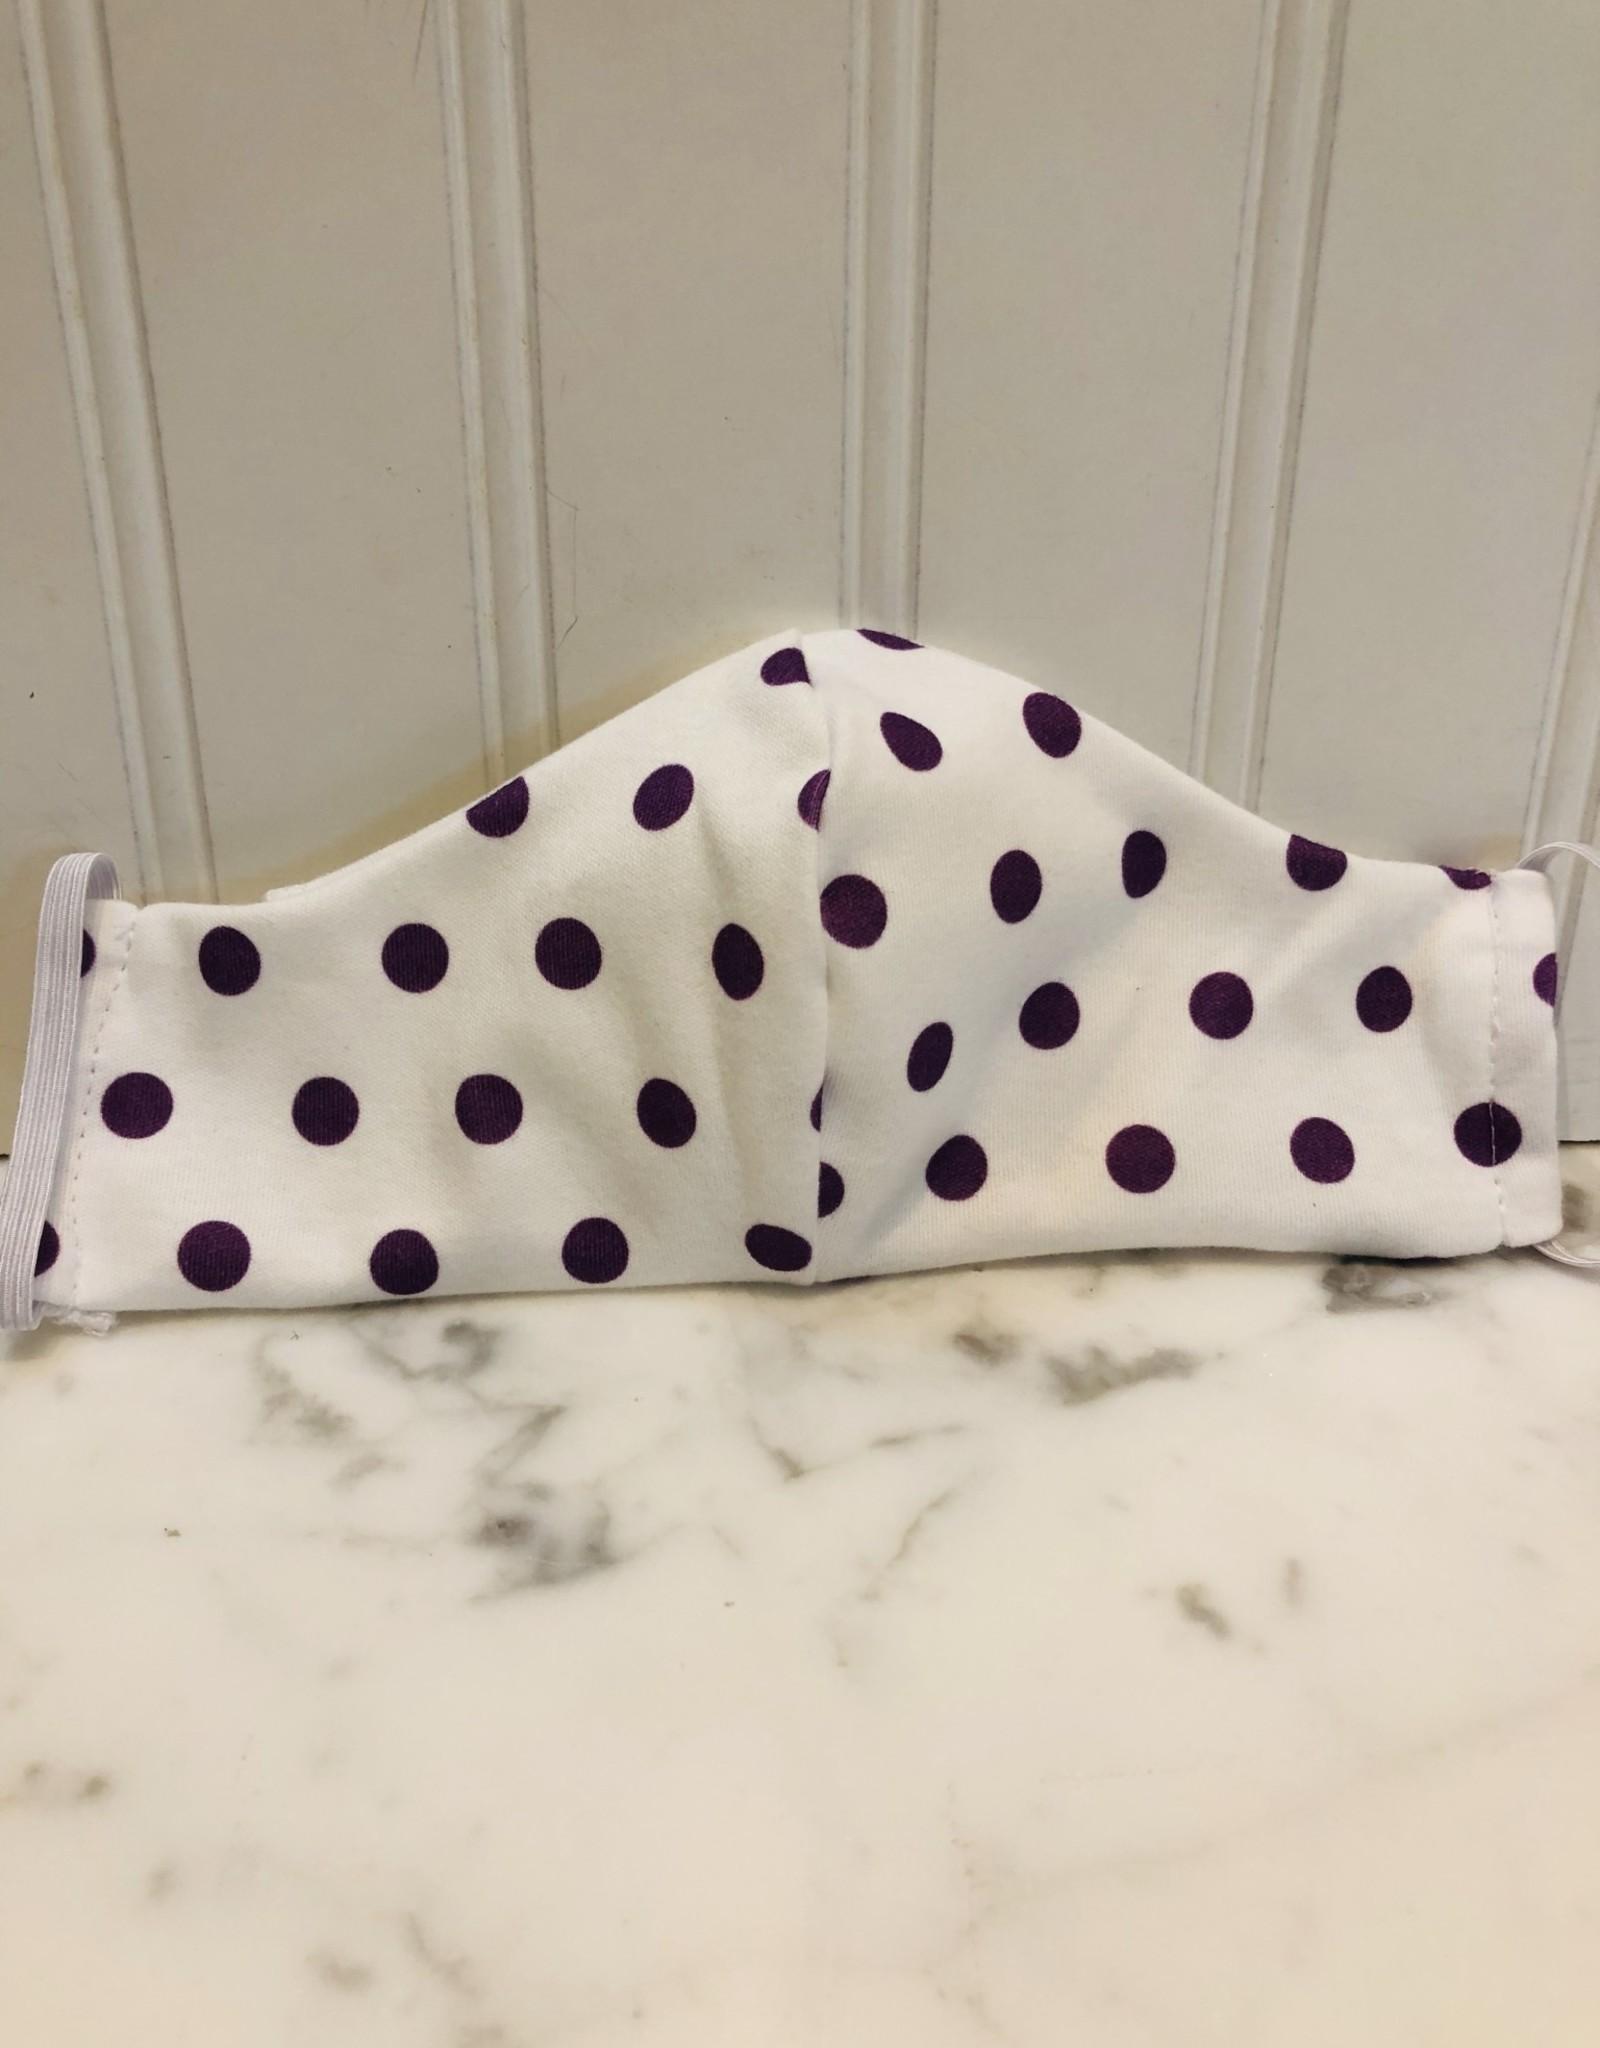 Jennifer Ann Cotton Mask - Youth Purple Polka Dot   7-13 Years